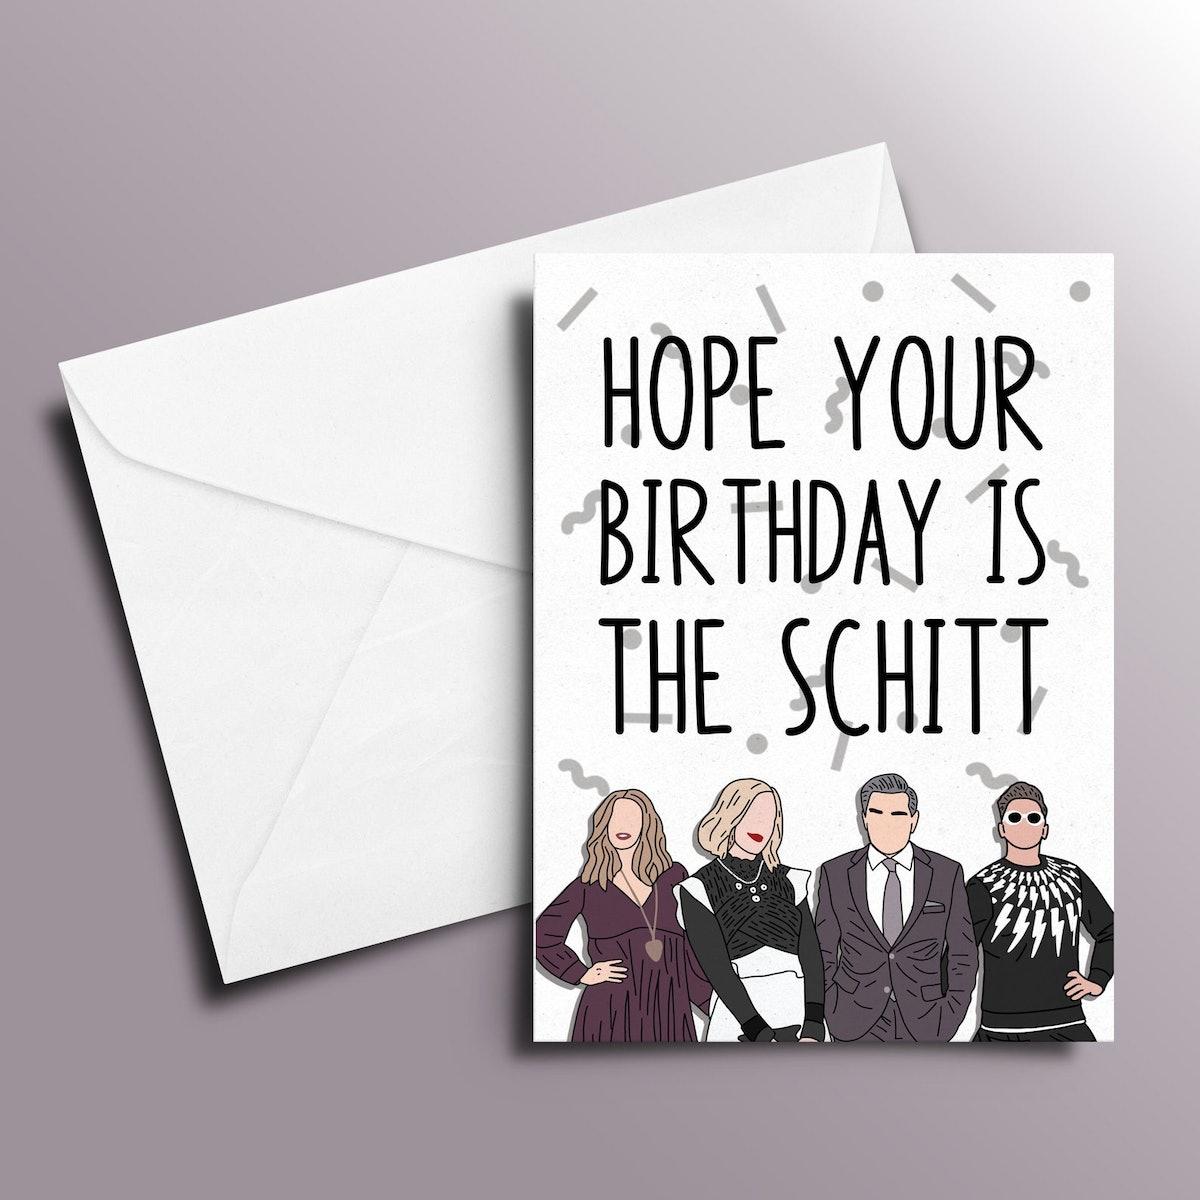 Hope Your Birthday Is The Schitt